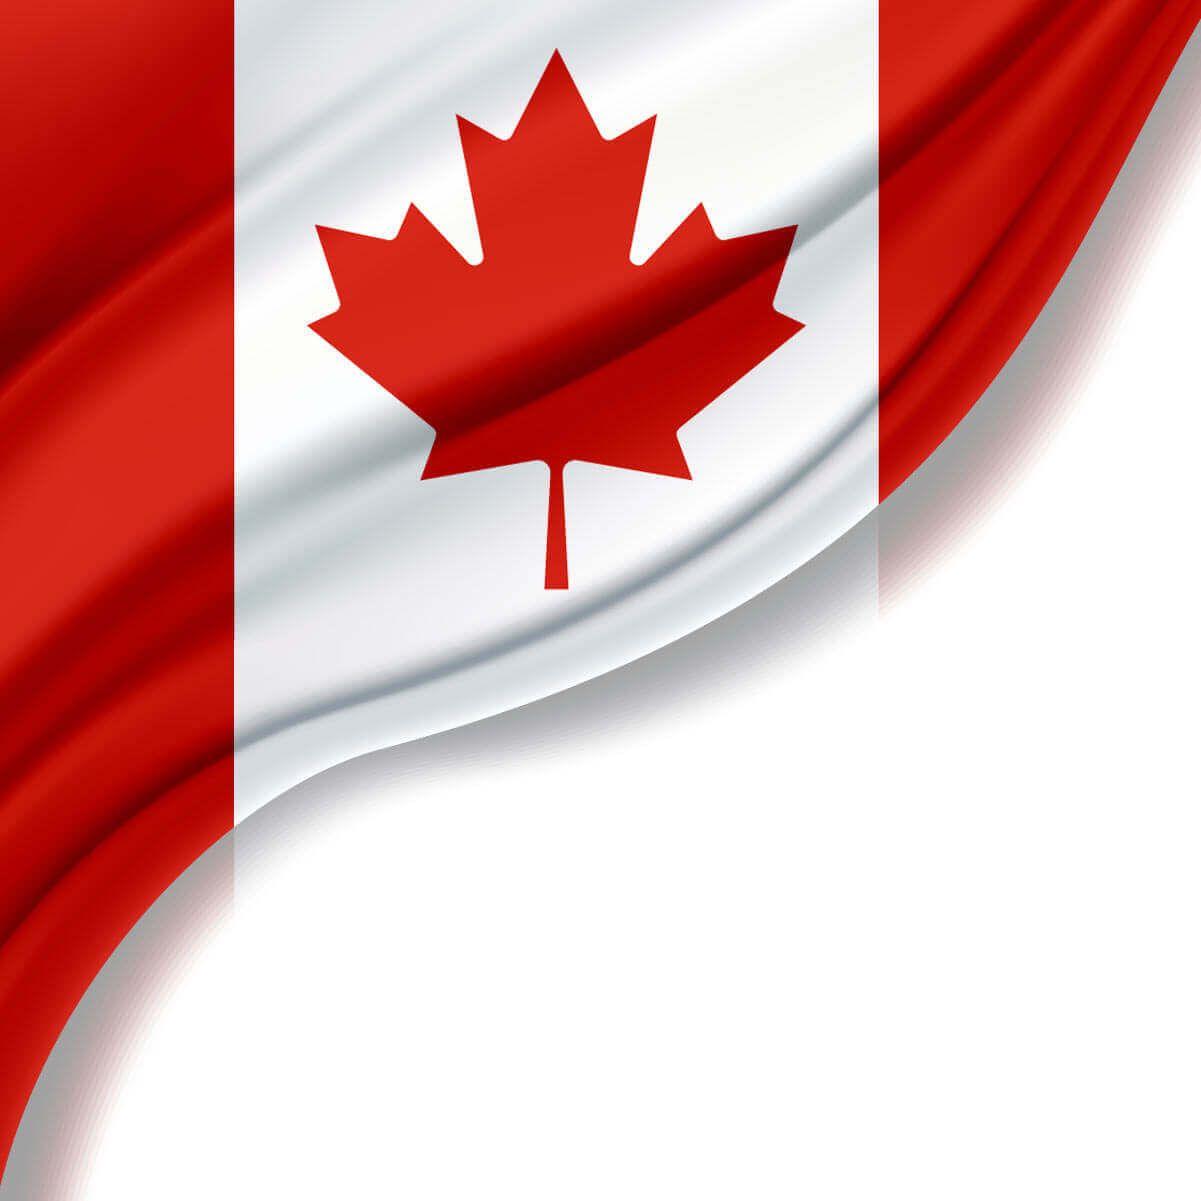 8dc5133d9b31317635add71fc58e75f2 - What Is The Best Vpn In Canada